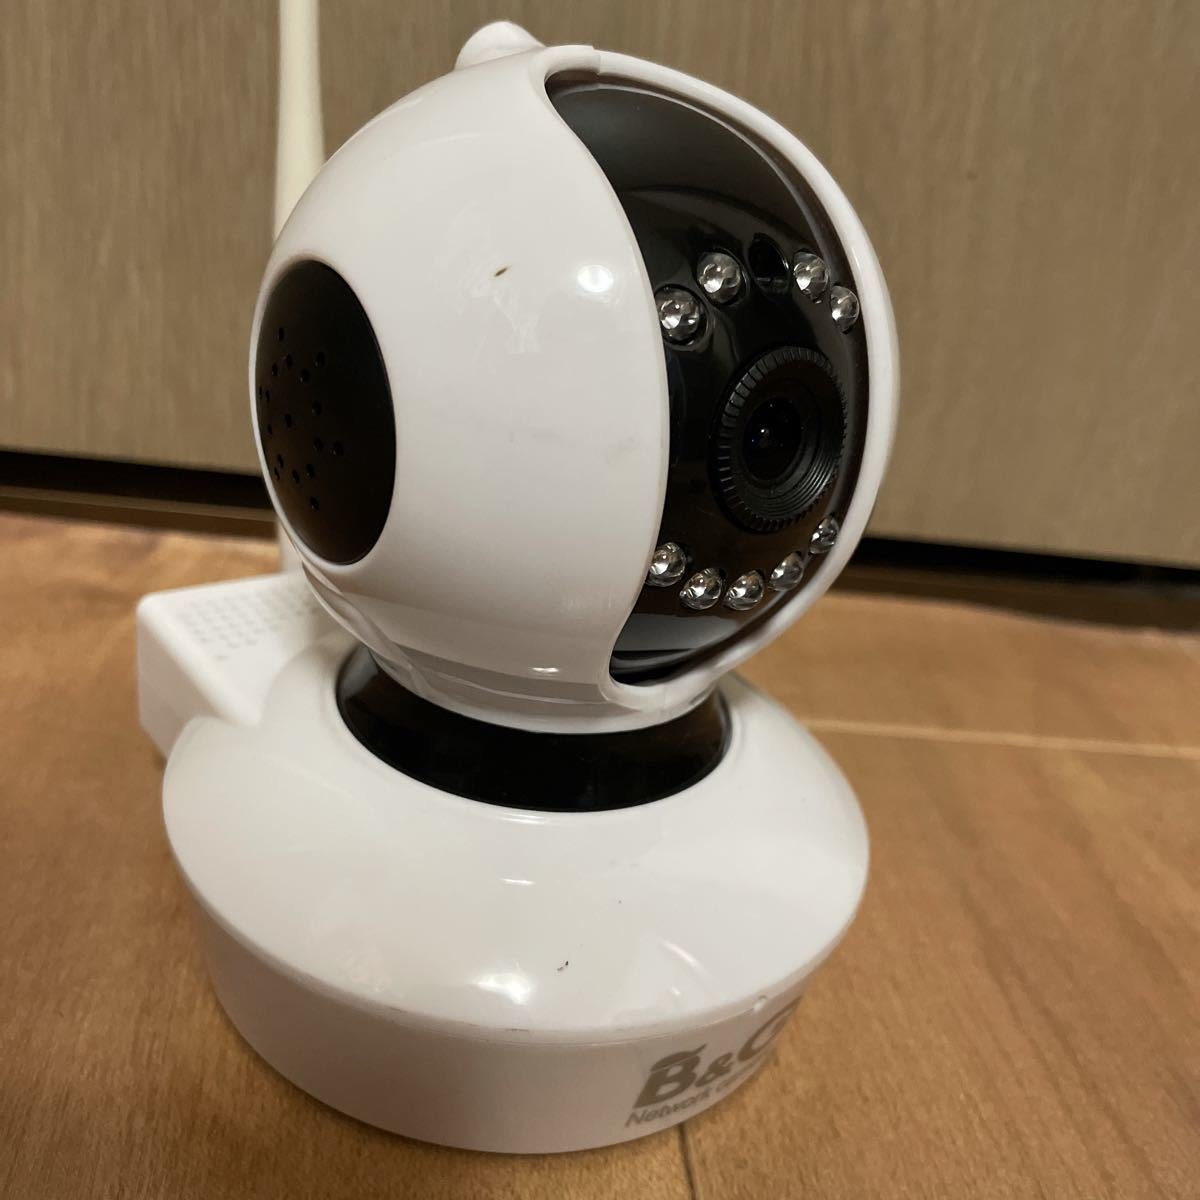 C7823WIP ネットワークカメラ 防犯カメラ